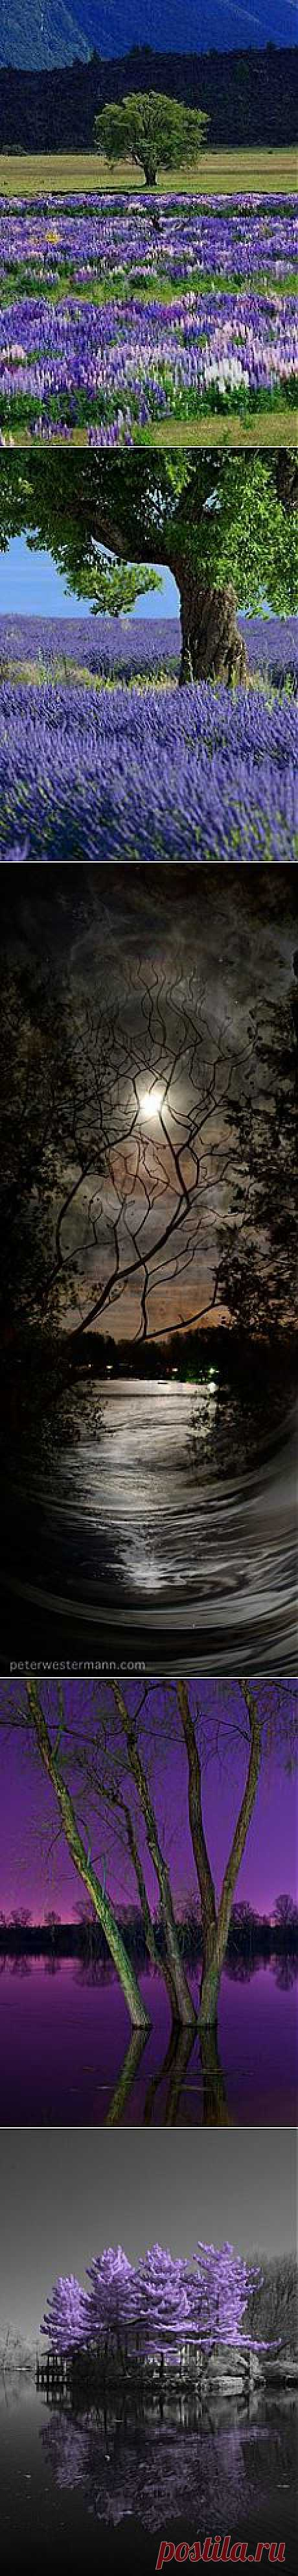 *Nature's Beauty в Pinterest